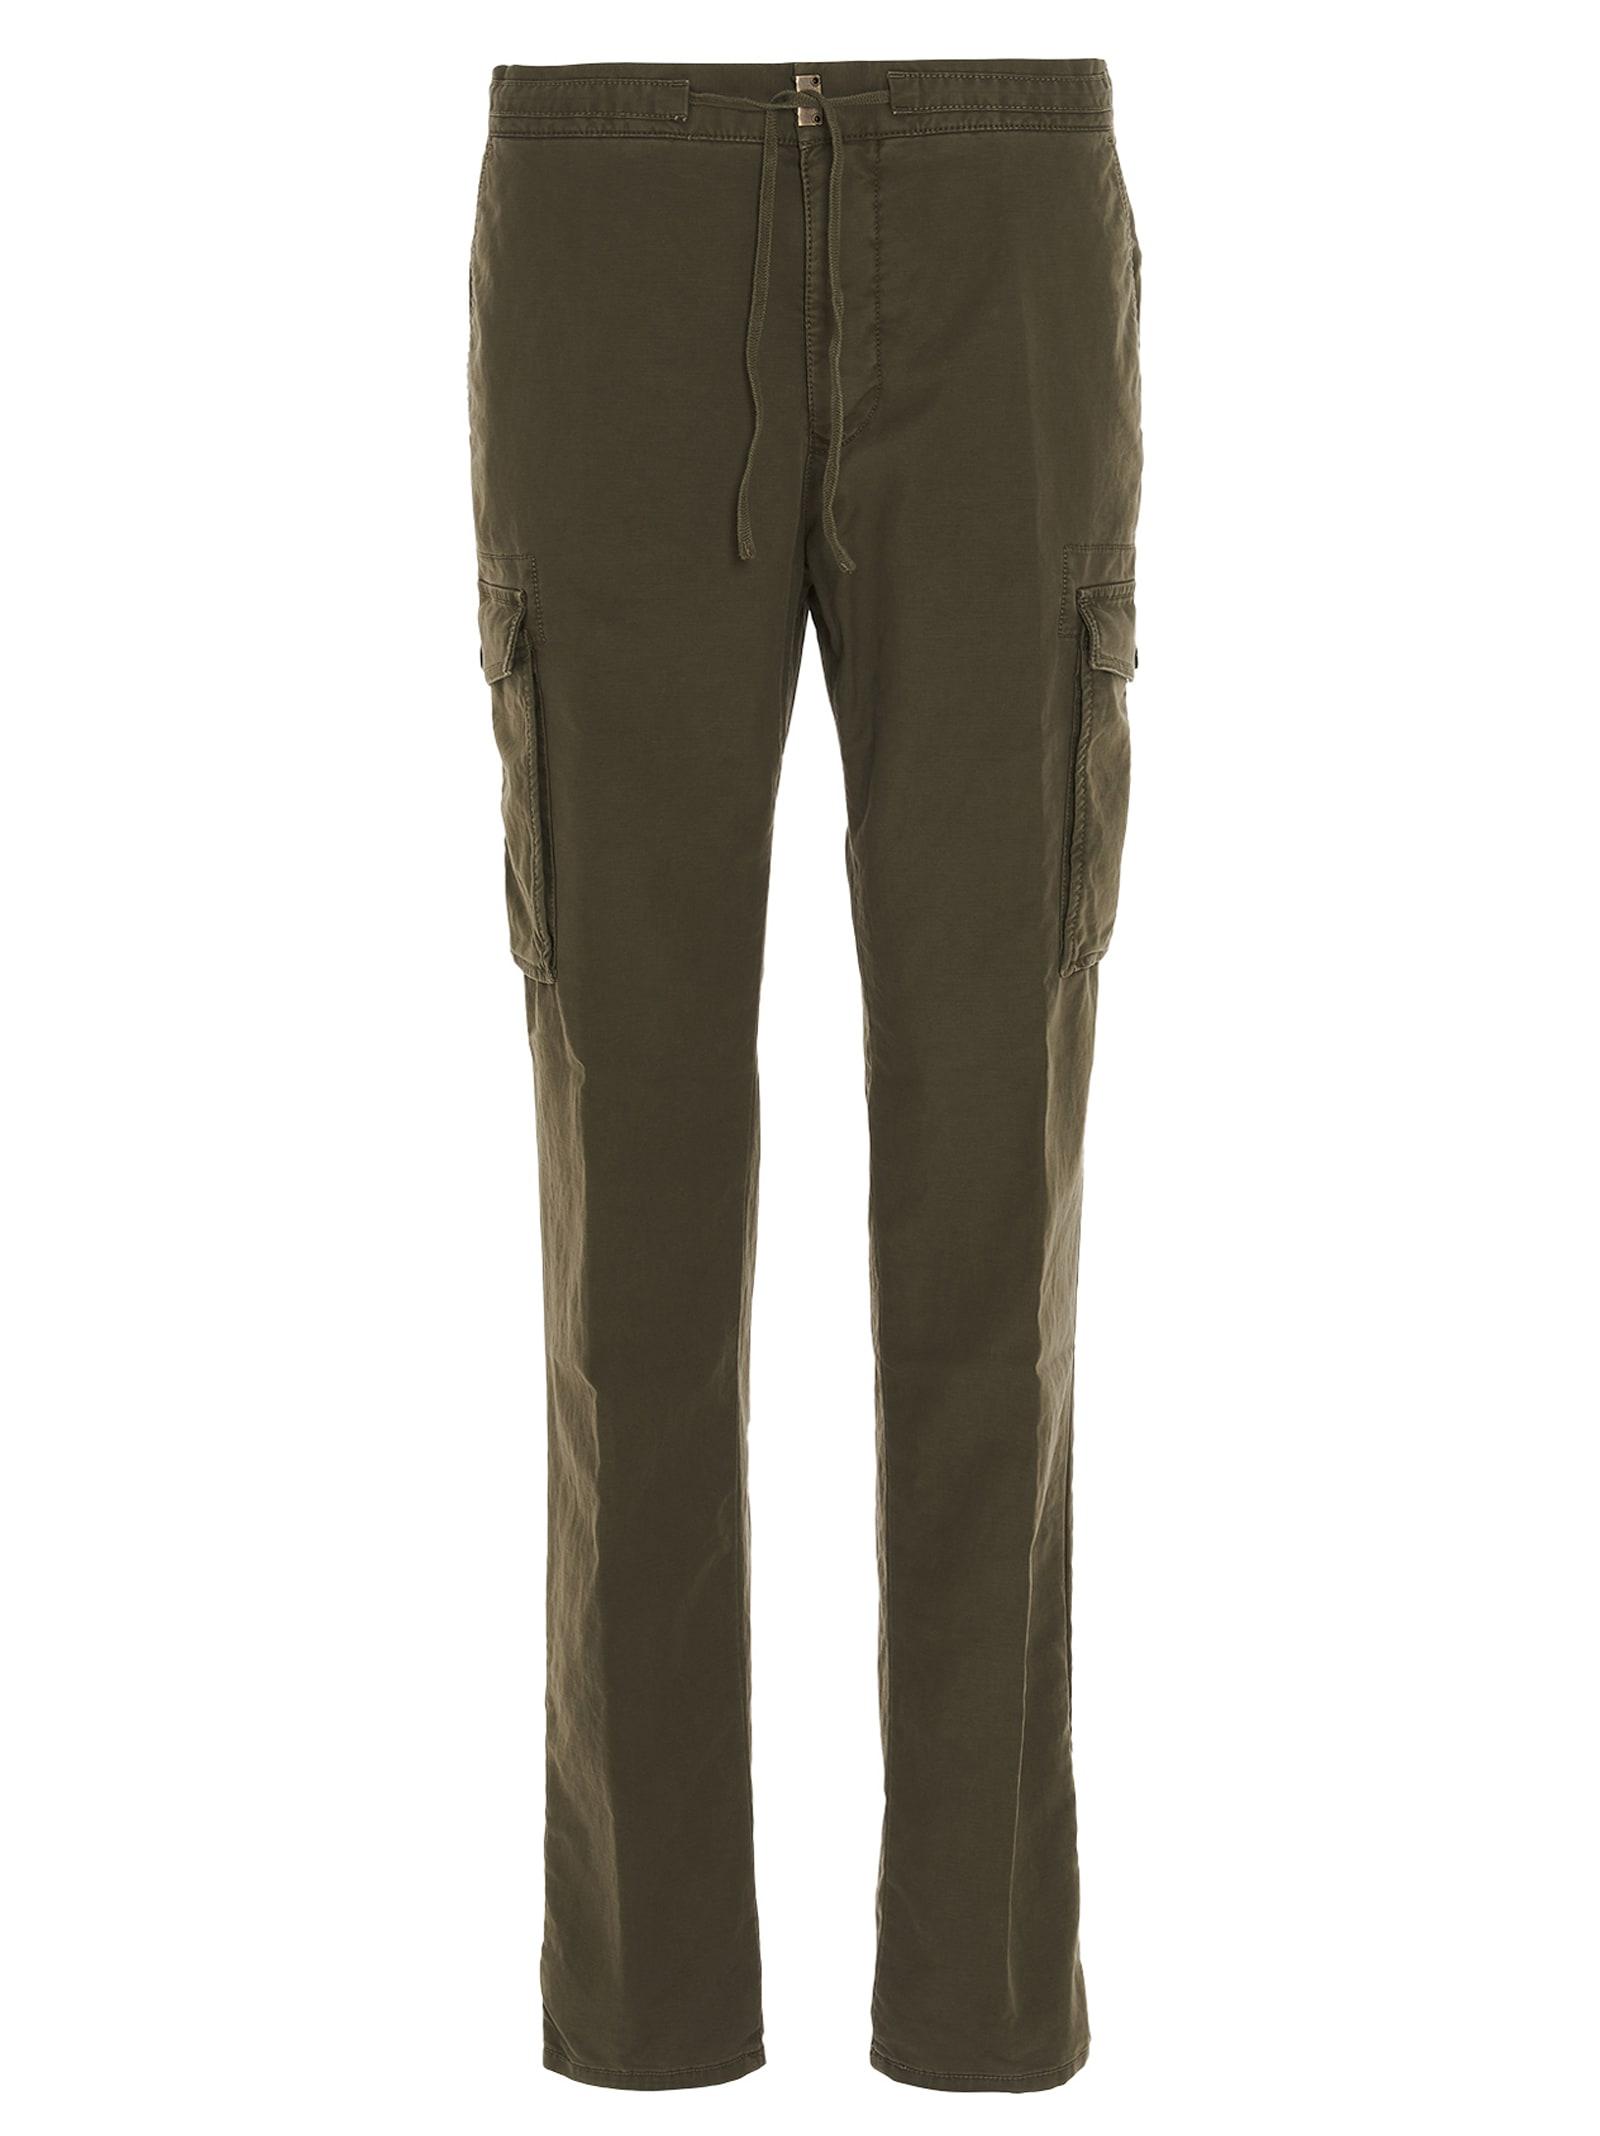 Incotex slacks Pants